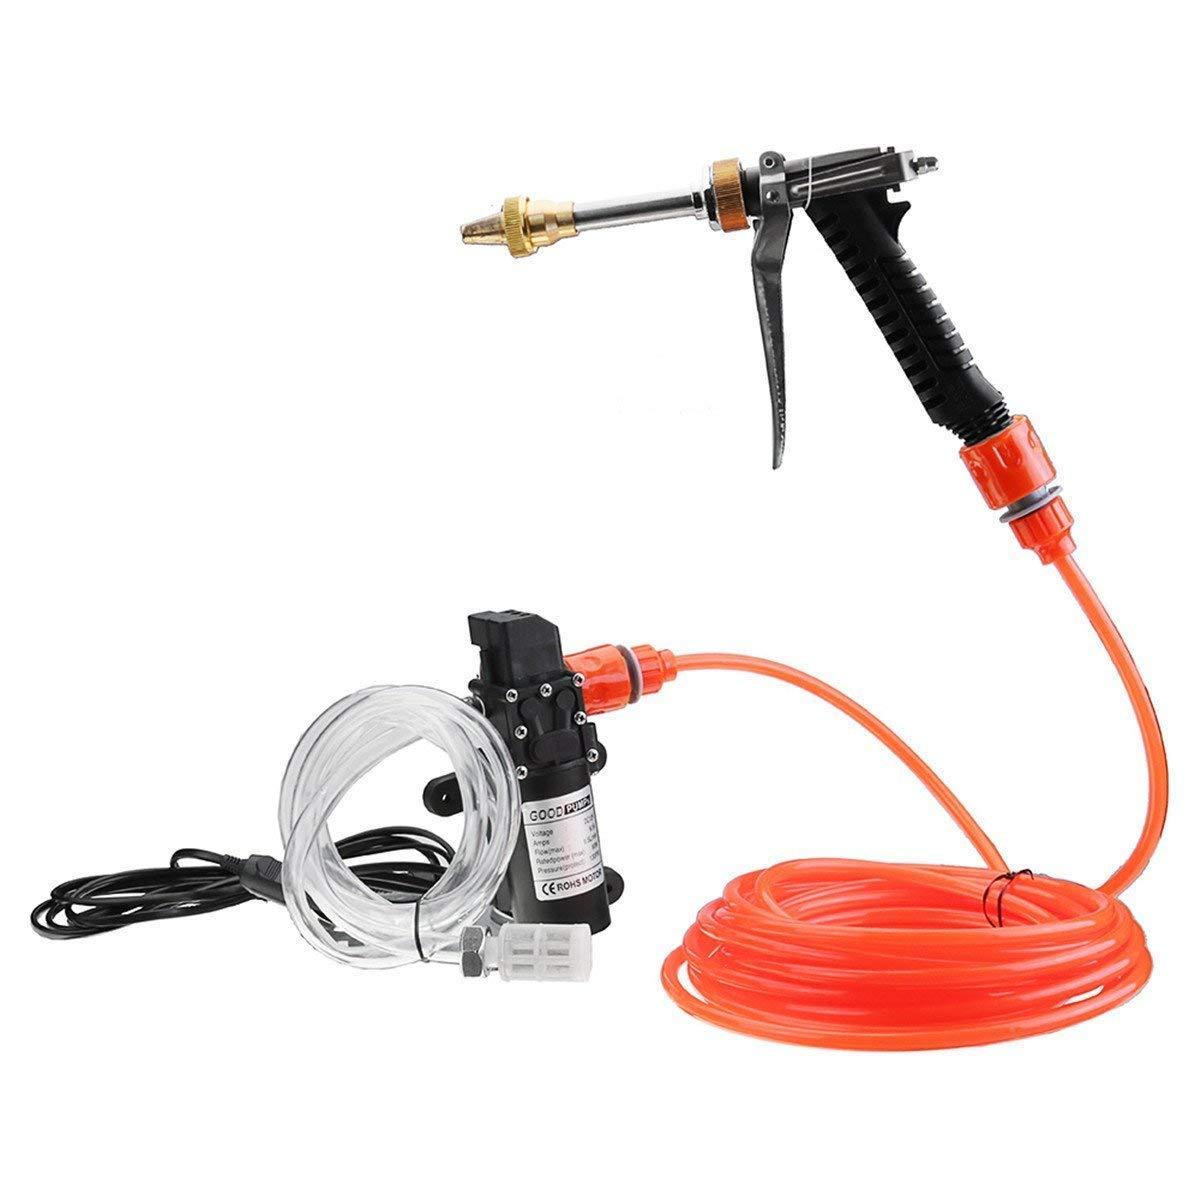 Good Car Clean Water Pump Submersible Portable Pump High Pressure Electric Car Window Washing Machine Water Pipe Gun Dc12v Yellow Tools